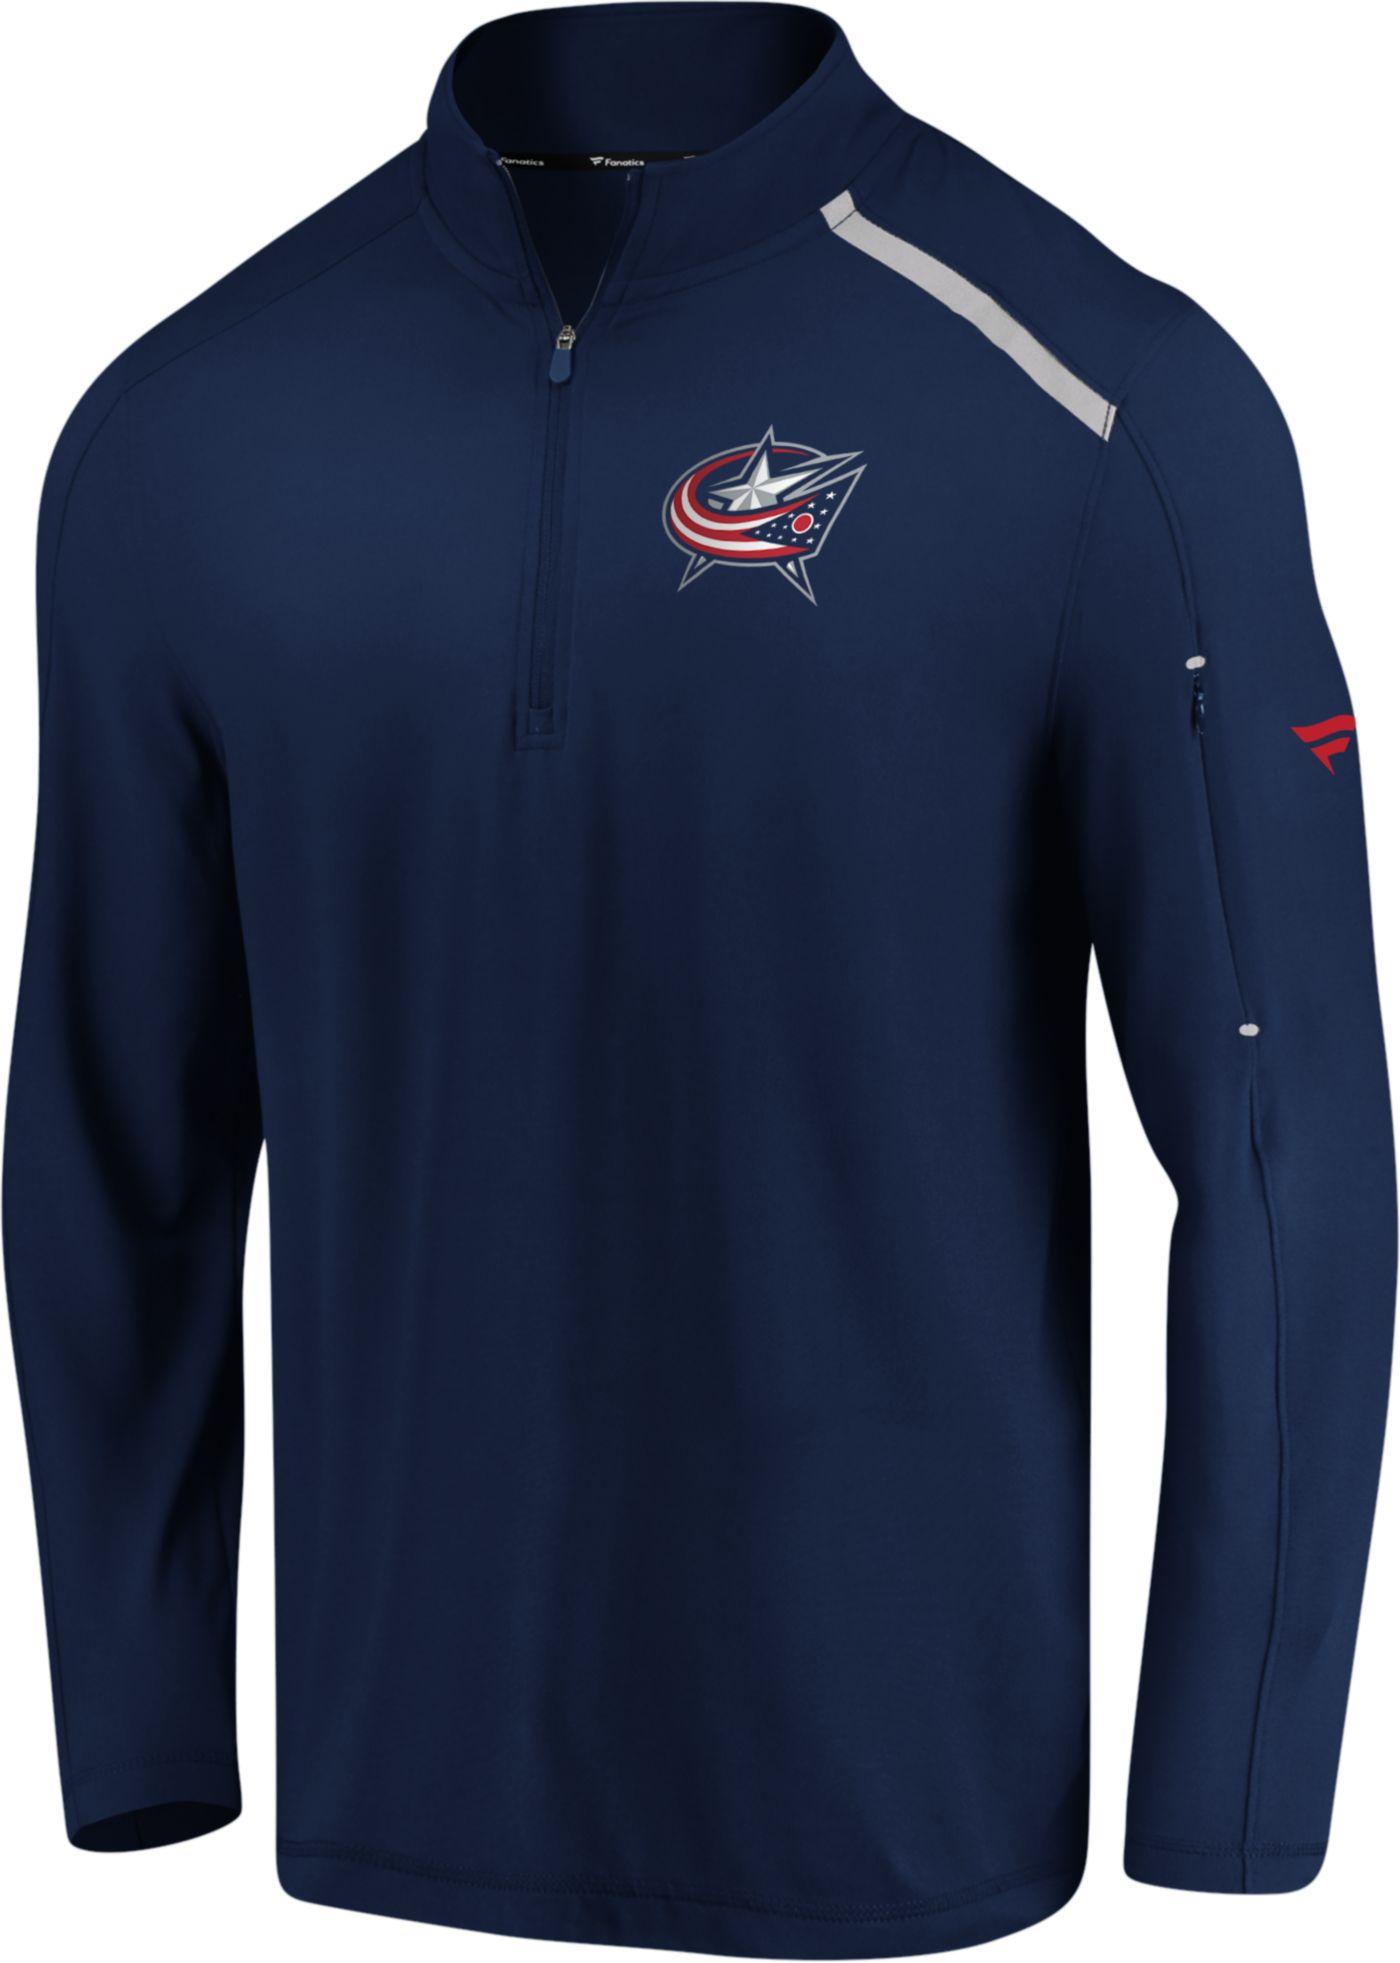 NHL Men's Columbus Blue Jackets Authentic Pro Clutch Navy Quarter-Zip Pullover